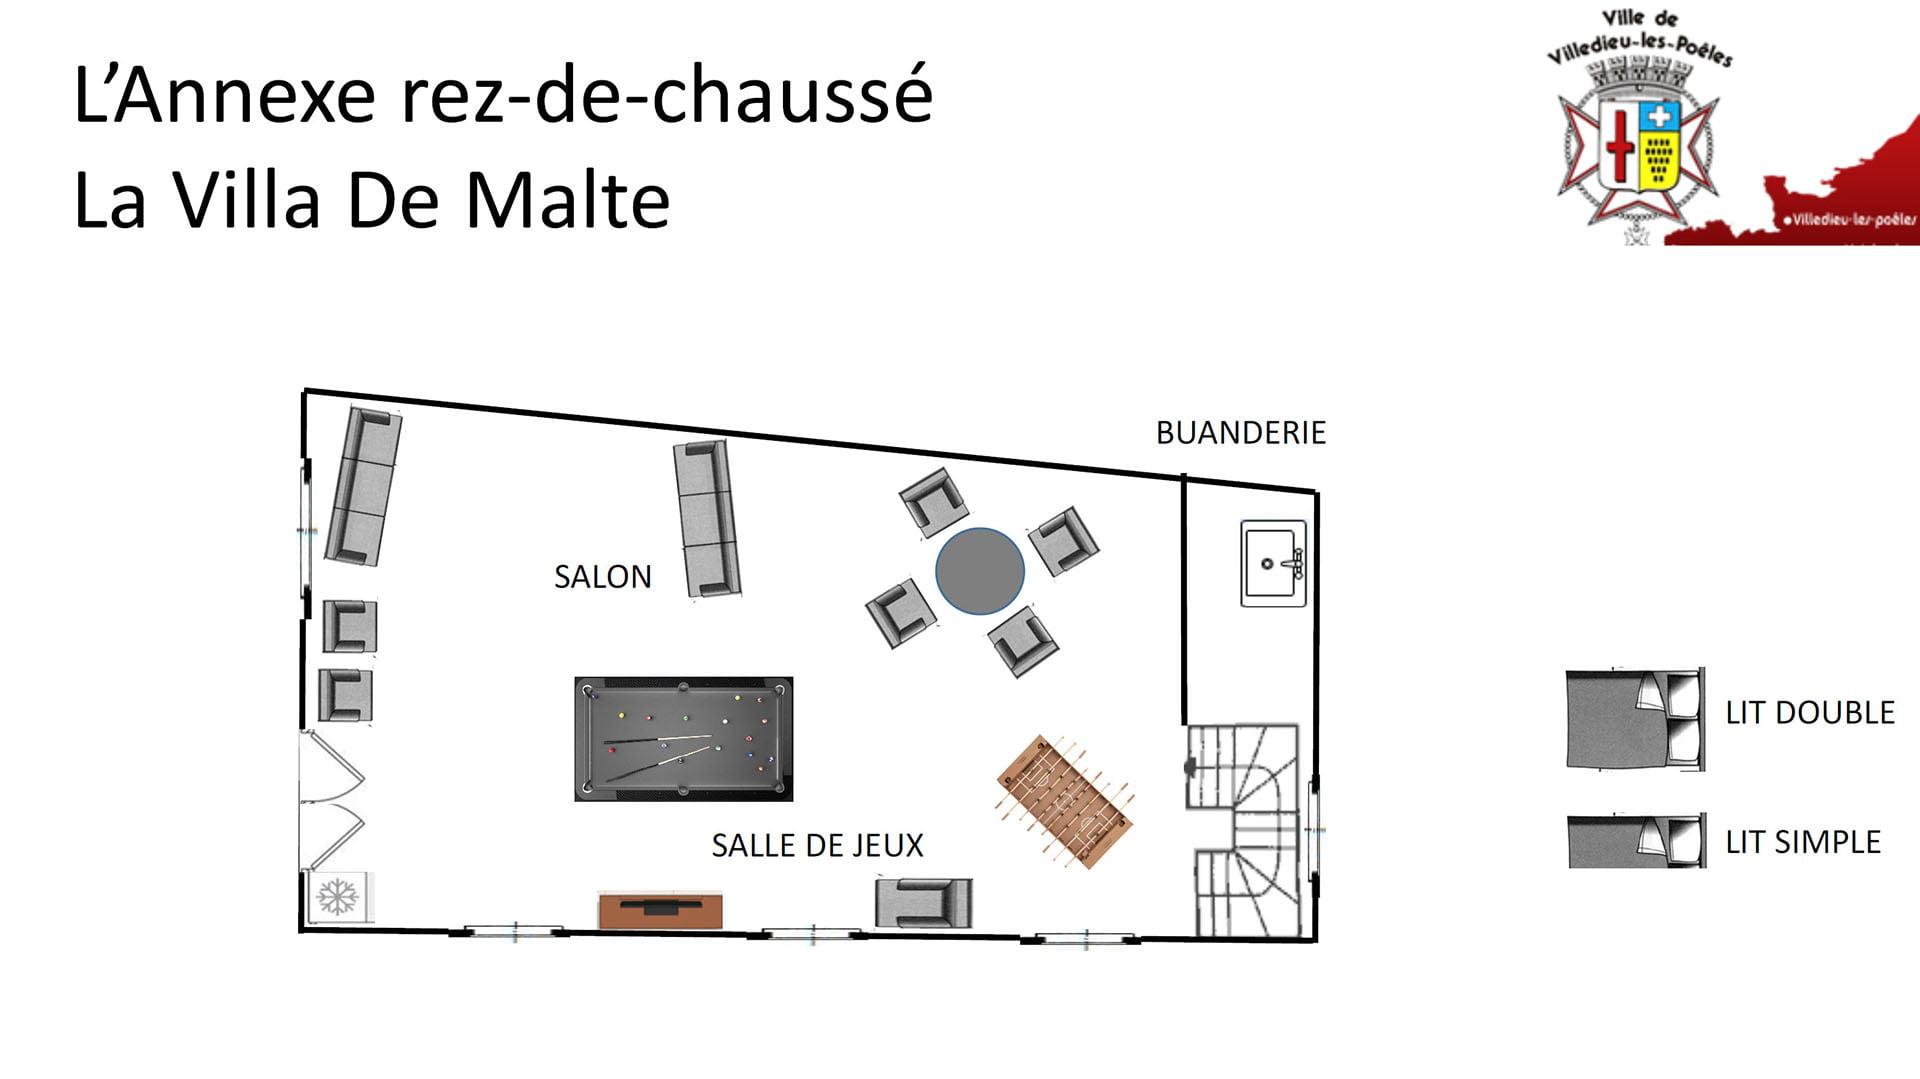 La Villa De Malte RDC Annexe - L'ANNEXE - Location de Gite La Clef Decamp - Laclefdecamp.fr